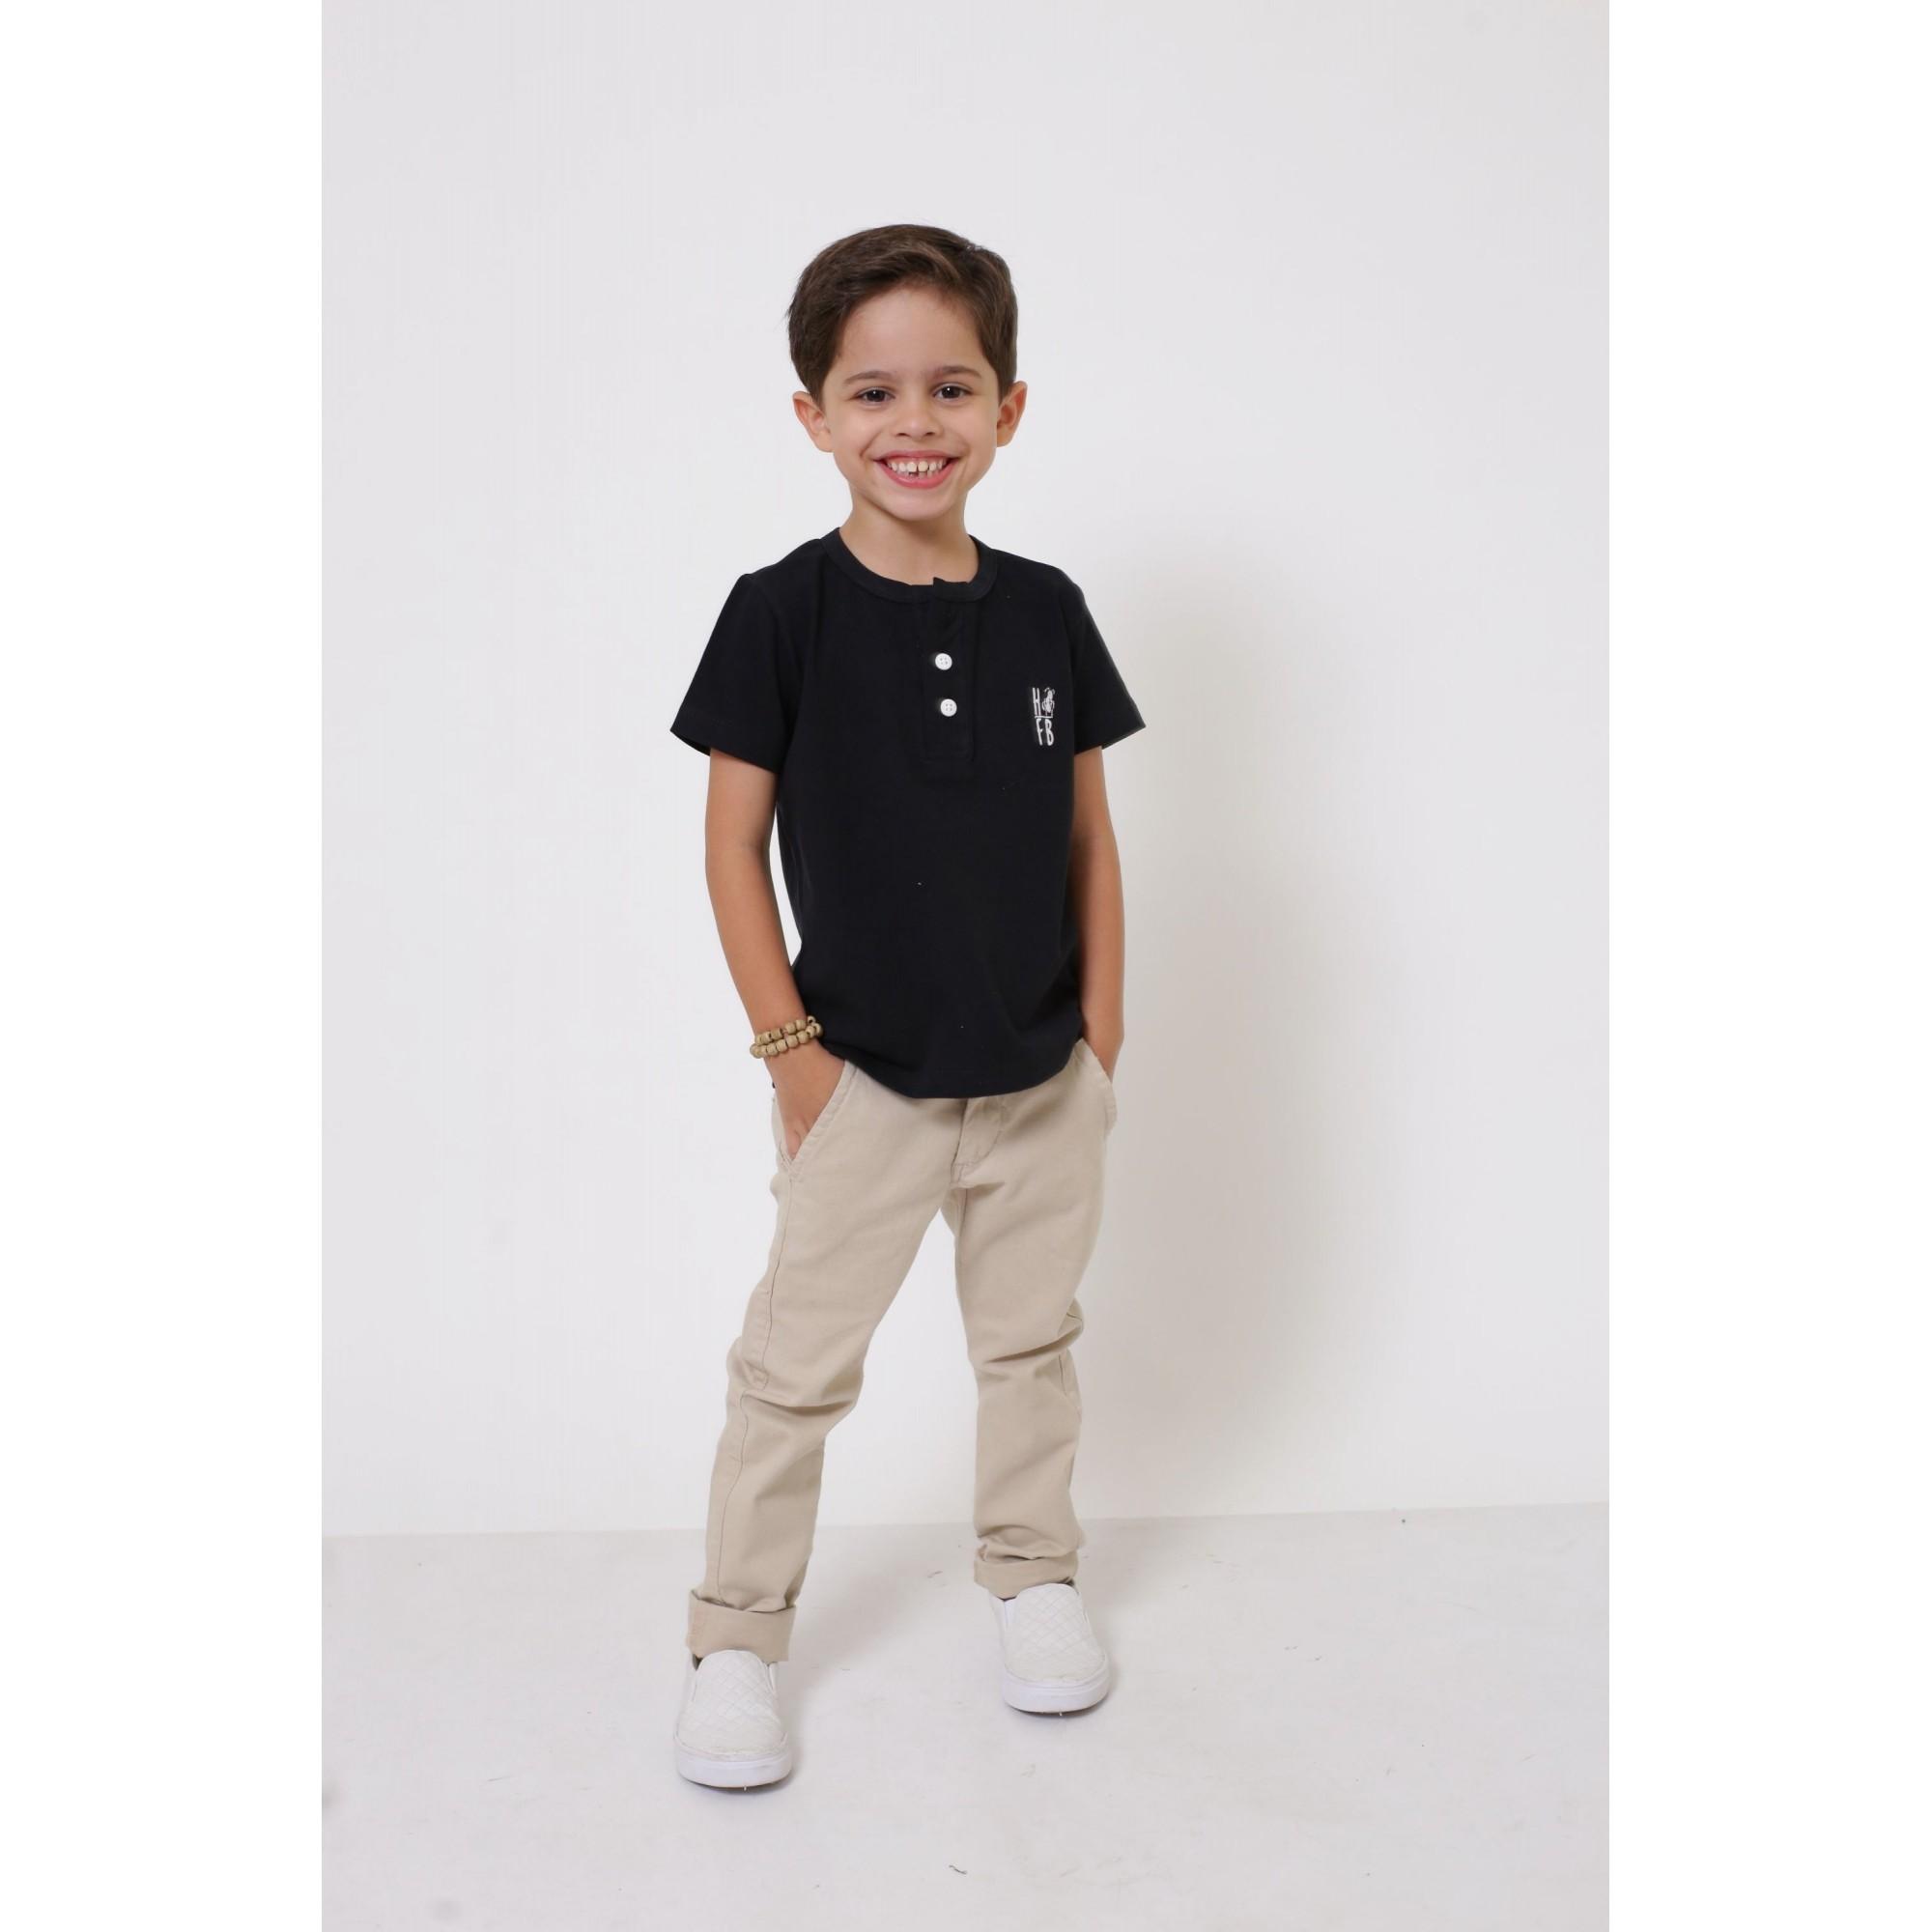 PAI E FILHO > 02 T-Shirts ou Body Henley - Preto  [Coleção Tal Pai Tal Filho]  - Heitor Fashion Brazil